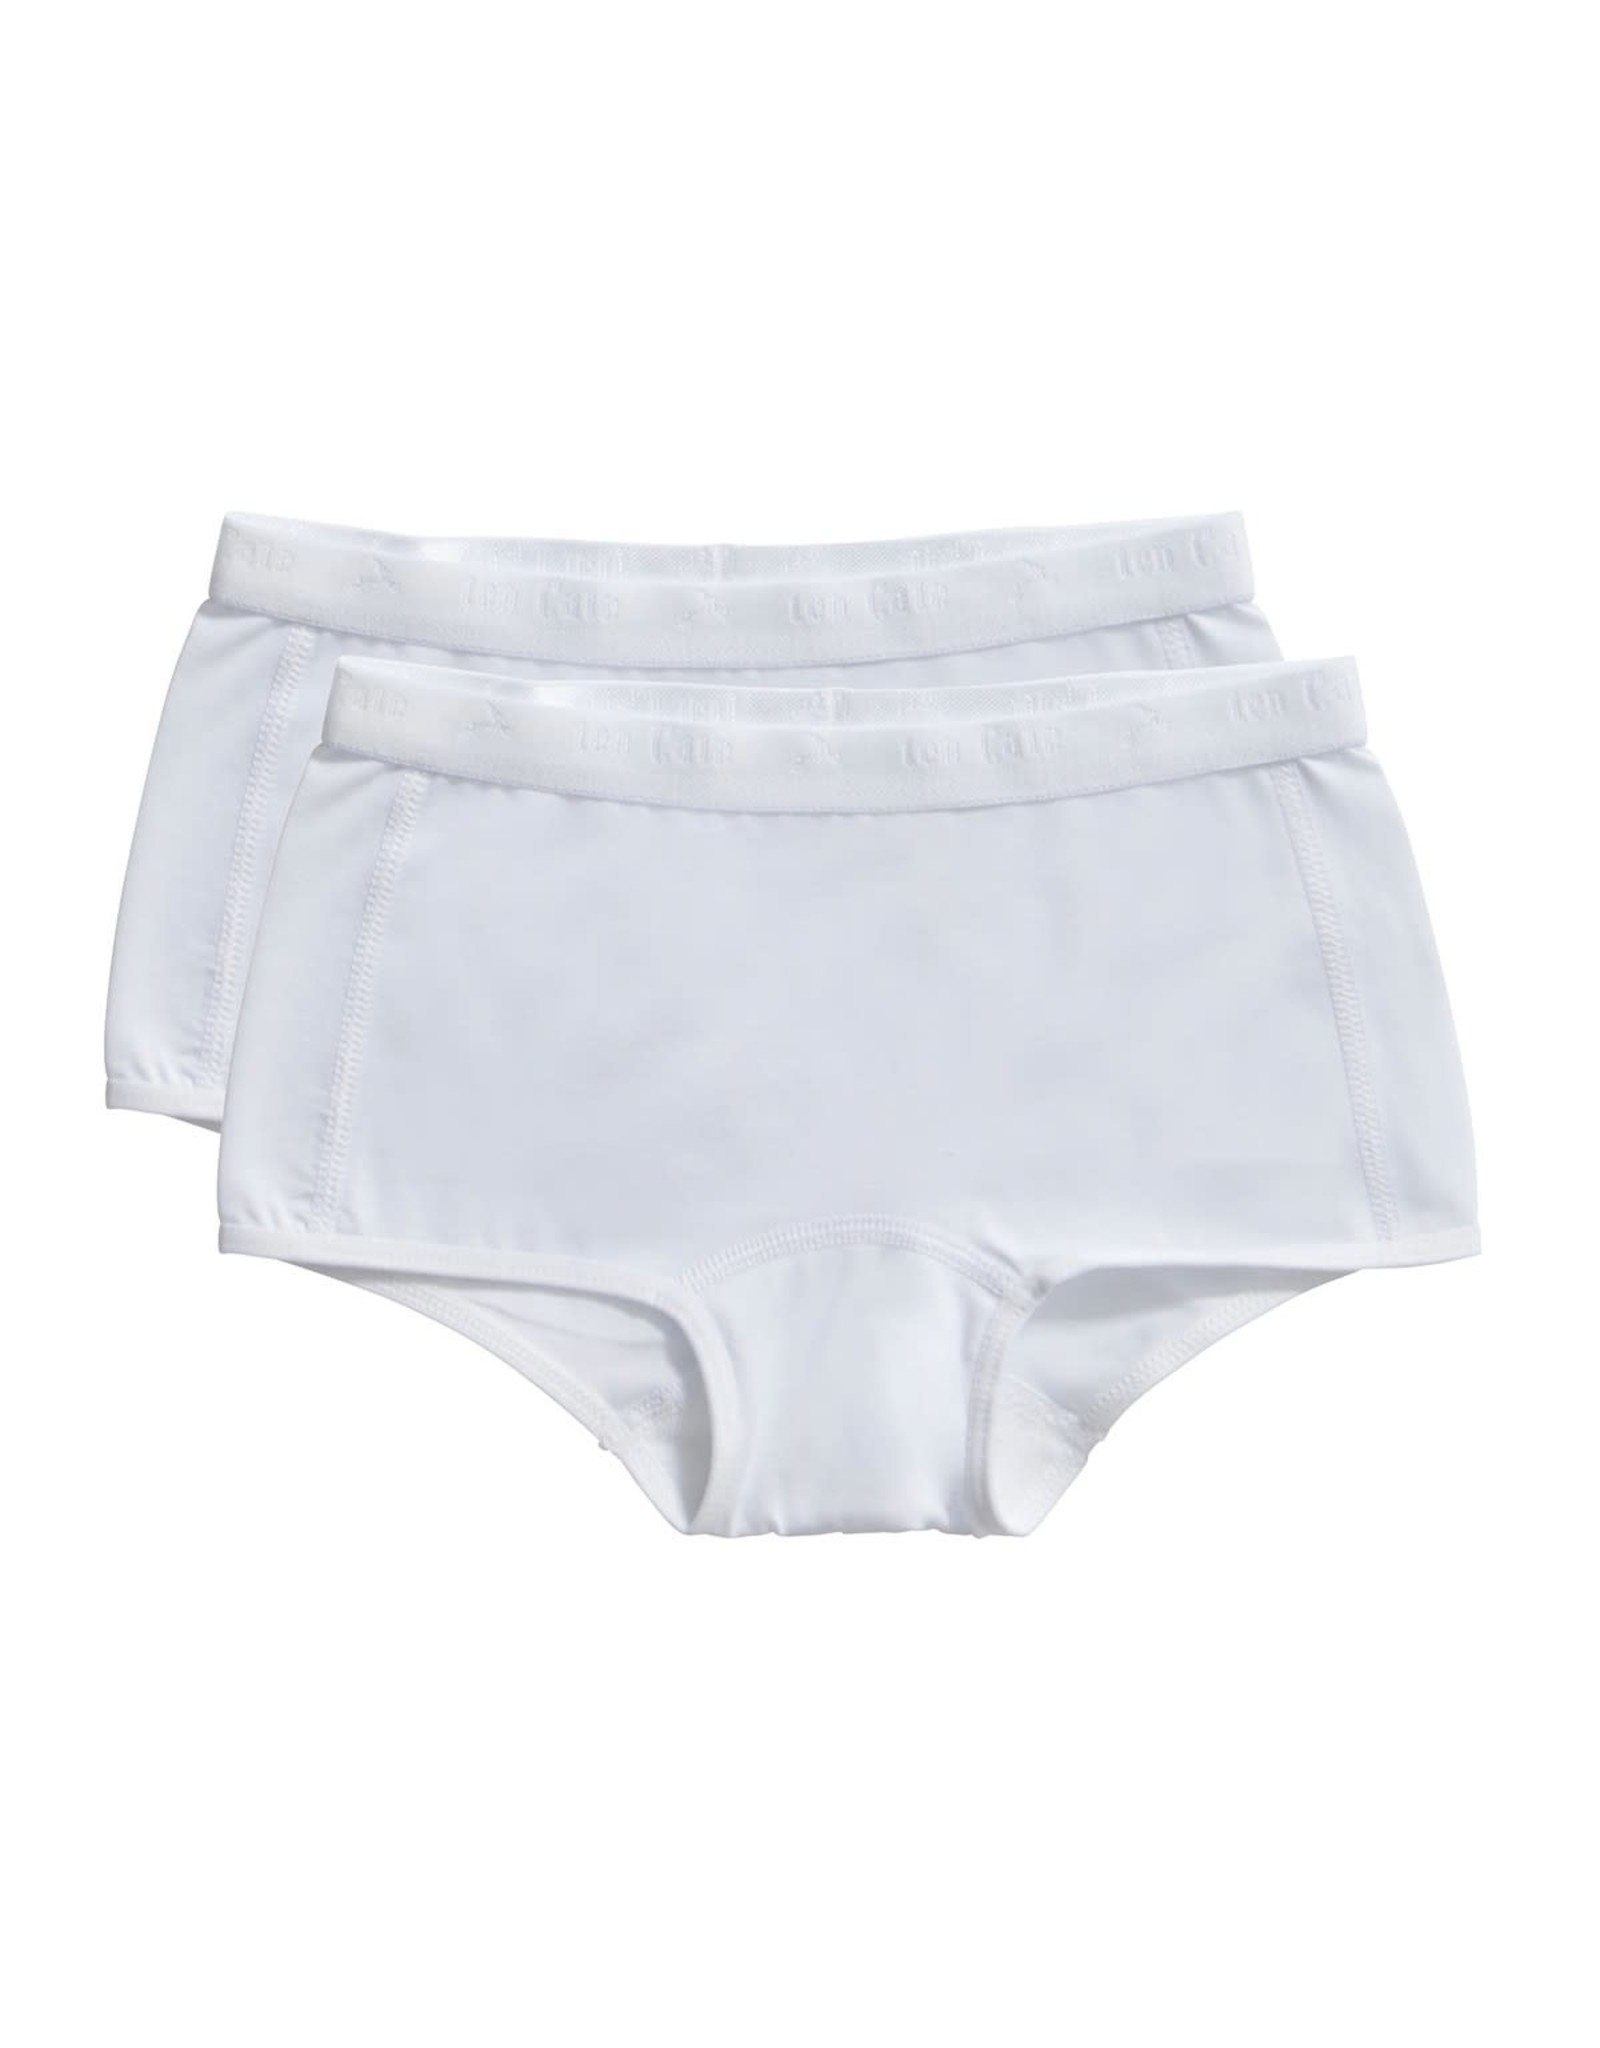 Ten Cate Basic girls shorts 2 pack white